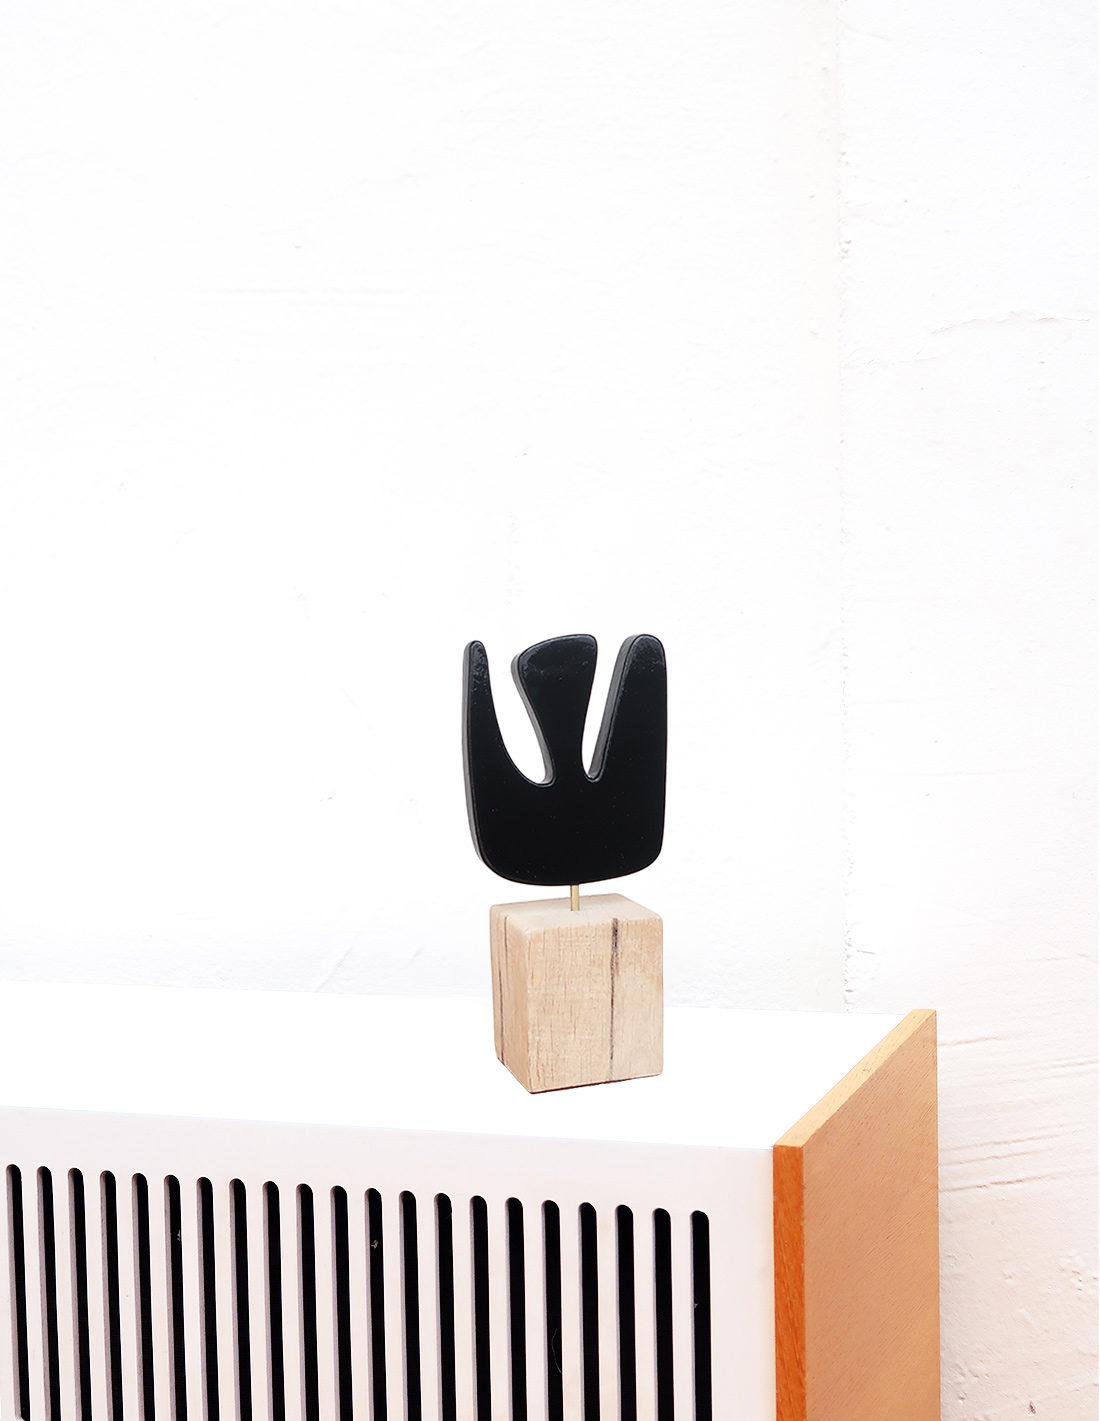 Amélie Dauteur - Sculpture - TSUNO